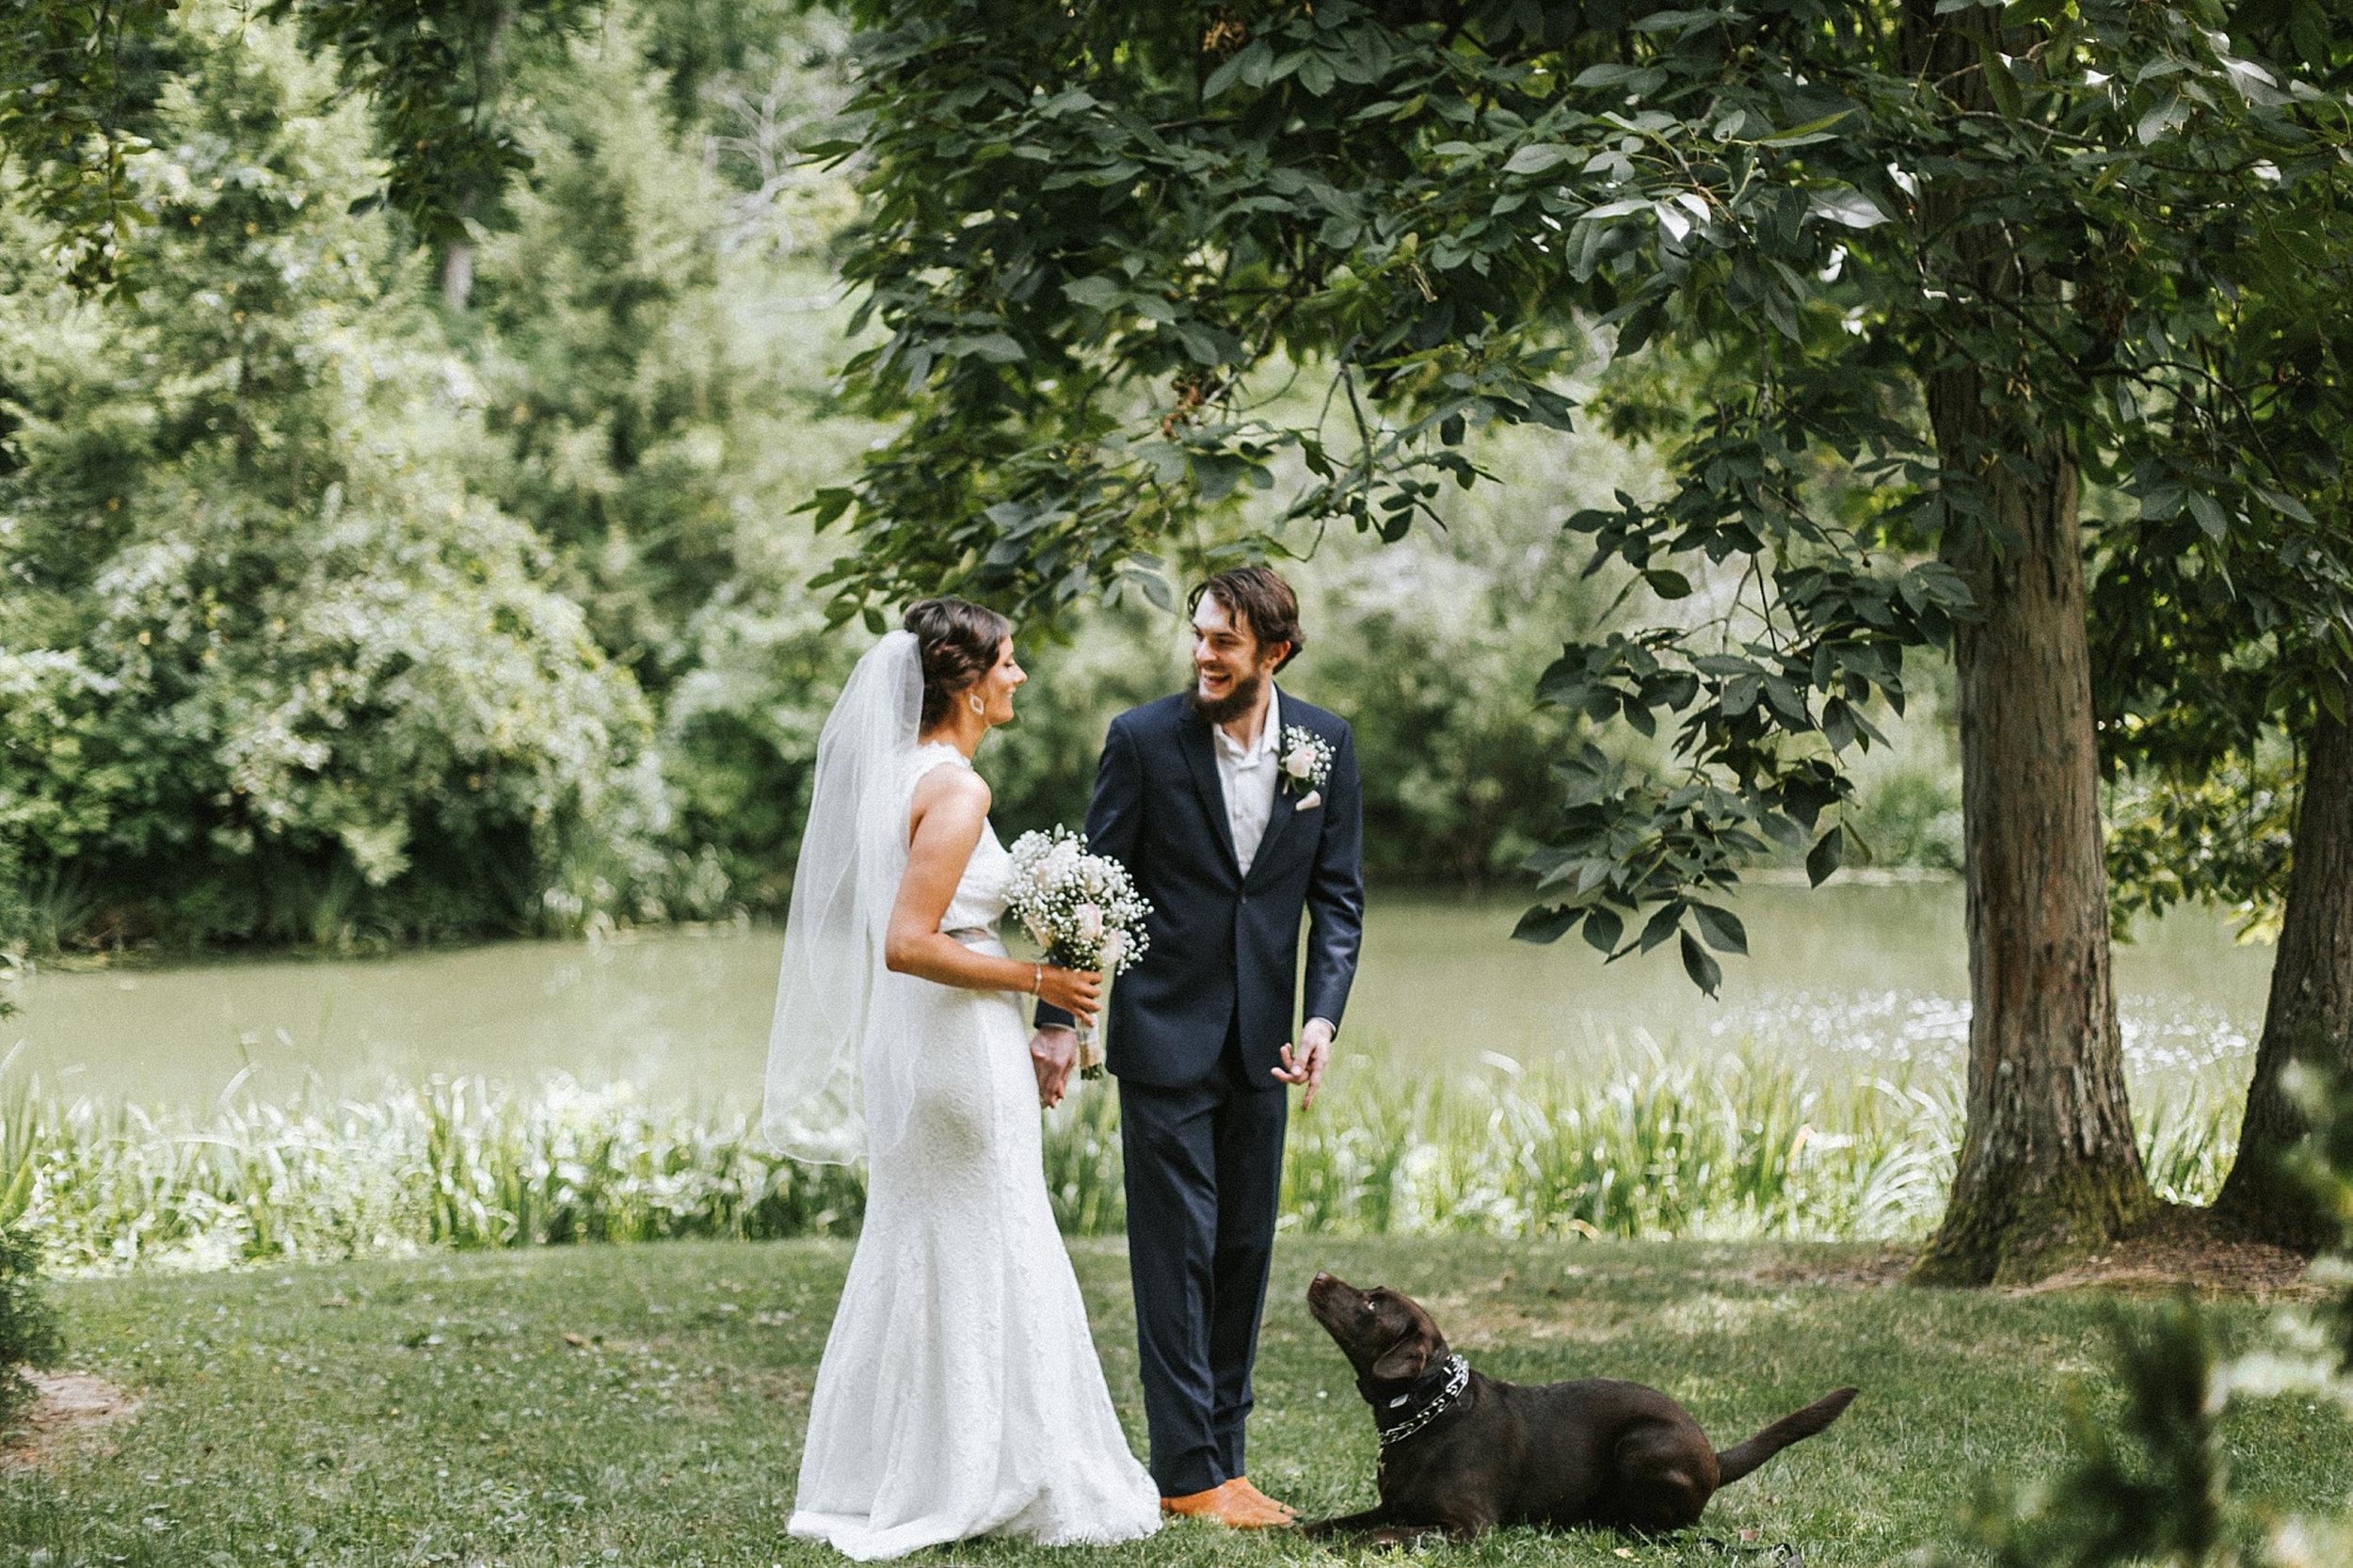 Brooke Townsend Photography - Ohio Wedding Photographer (9 of 78).jpg